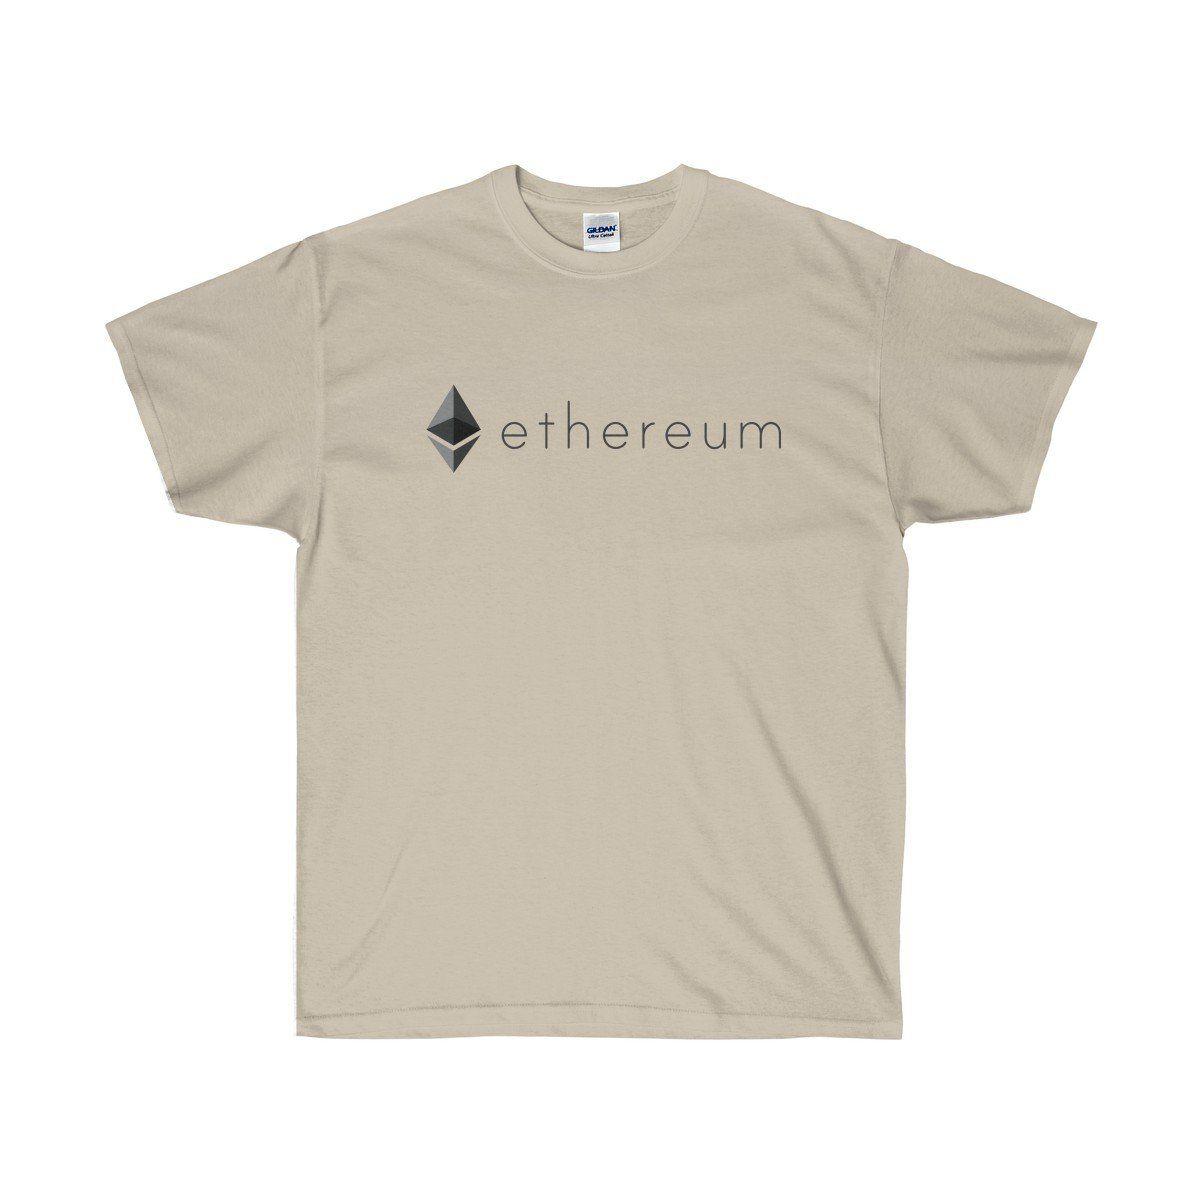 Ethereum Ultra Cotton T-Shirt